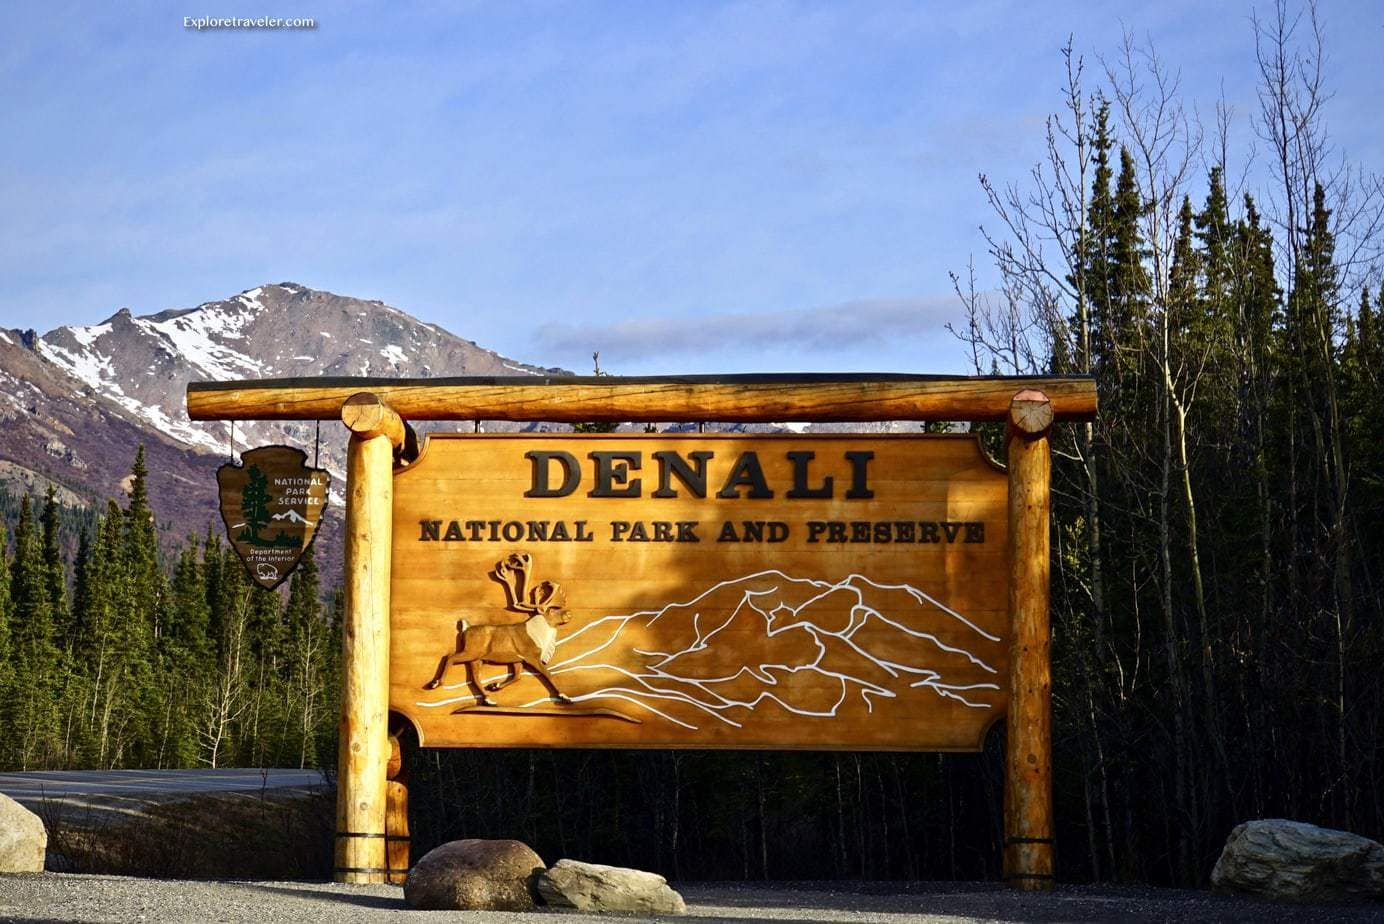 ExploreTraveler Denali National Park and Preserve In Alaska